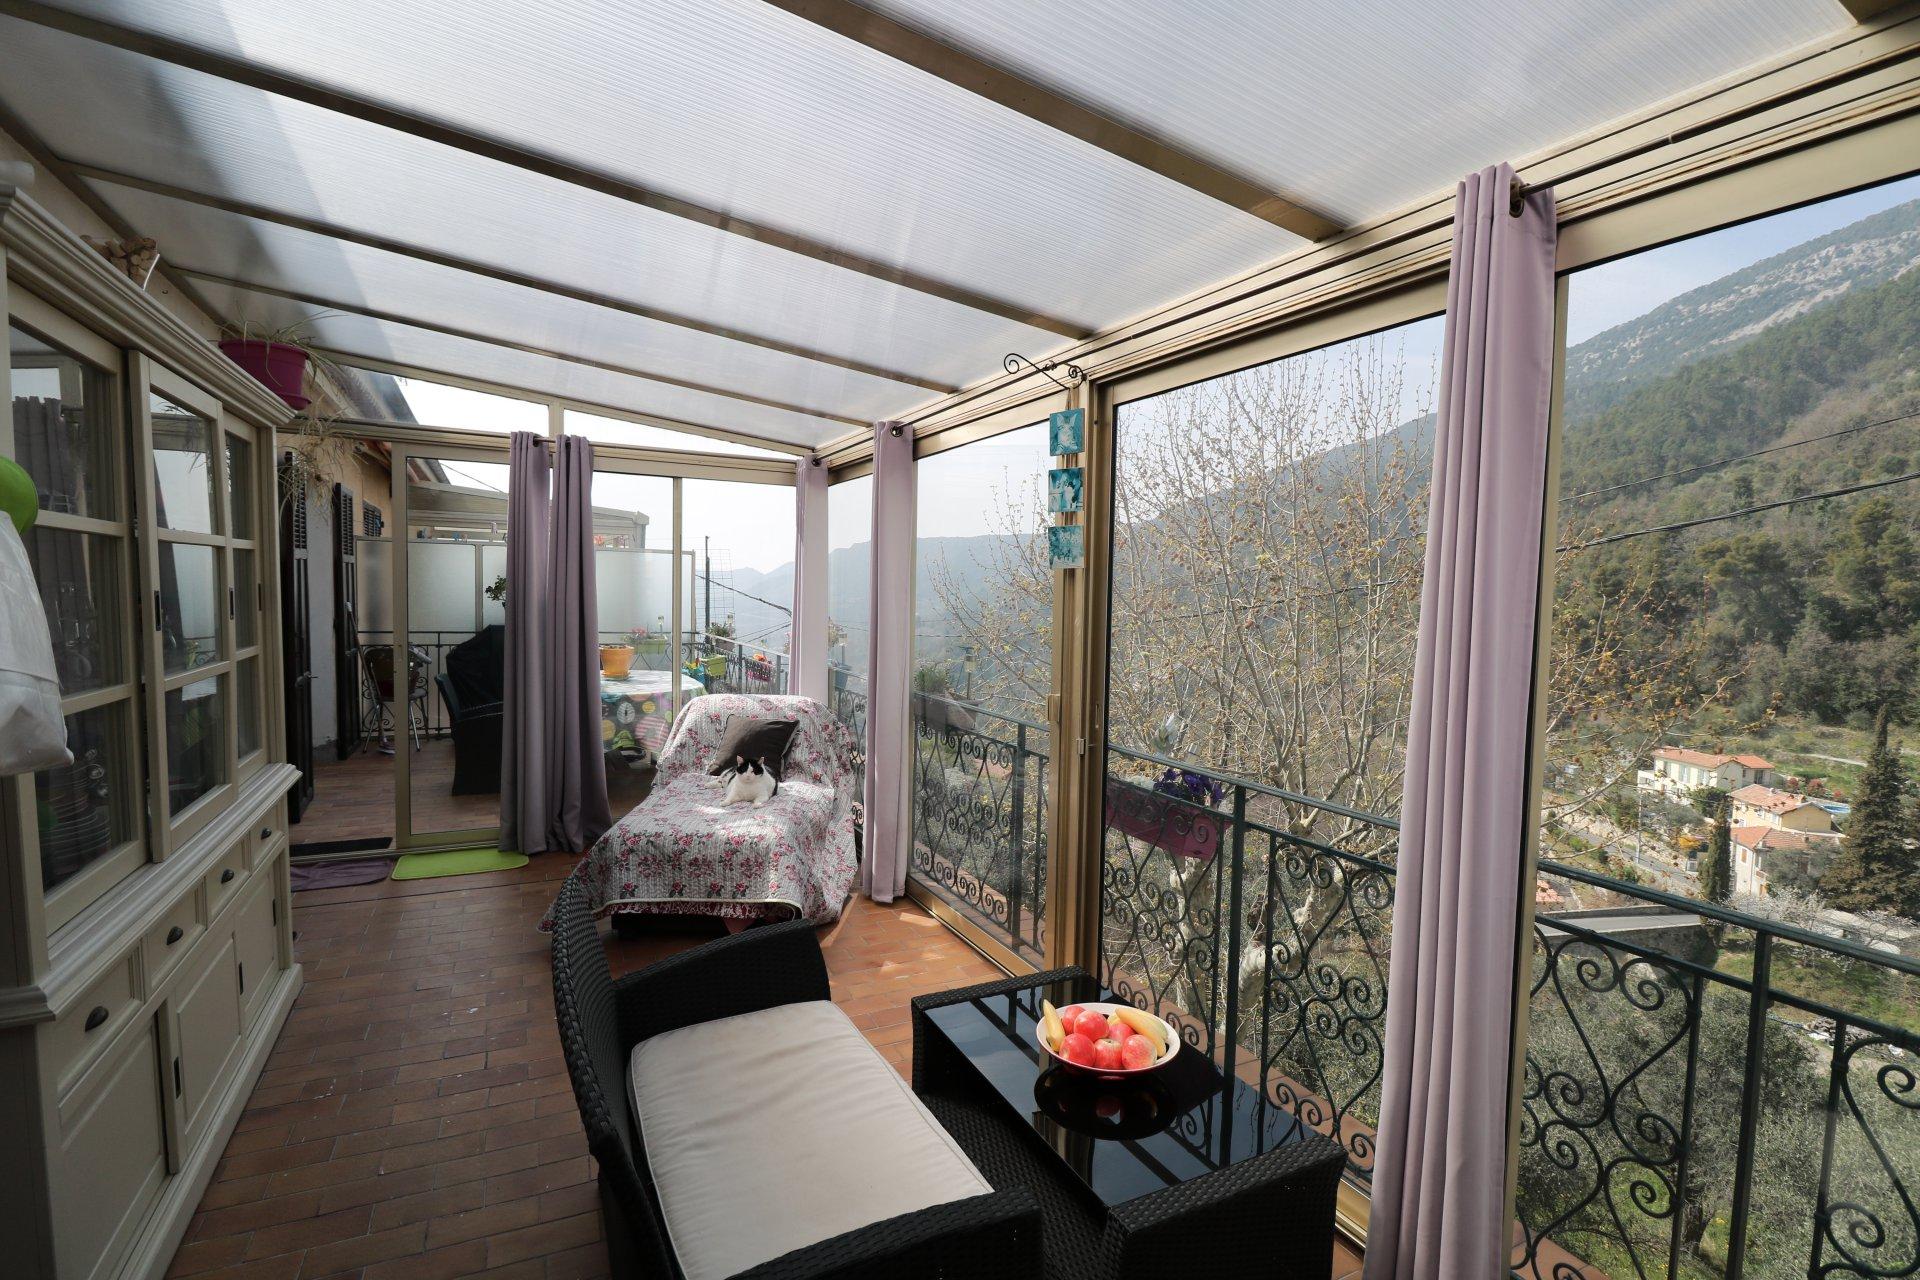 3 pièces, véranda, terrasse